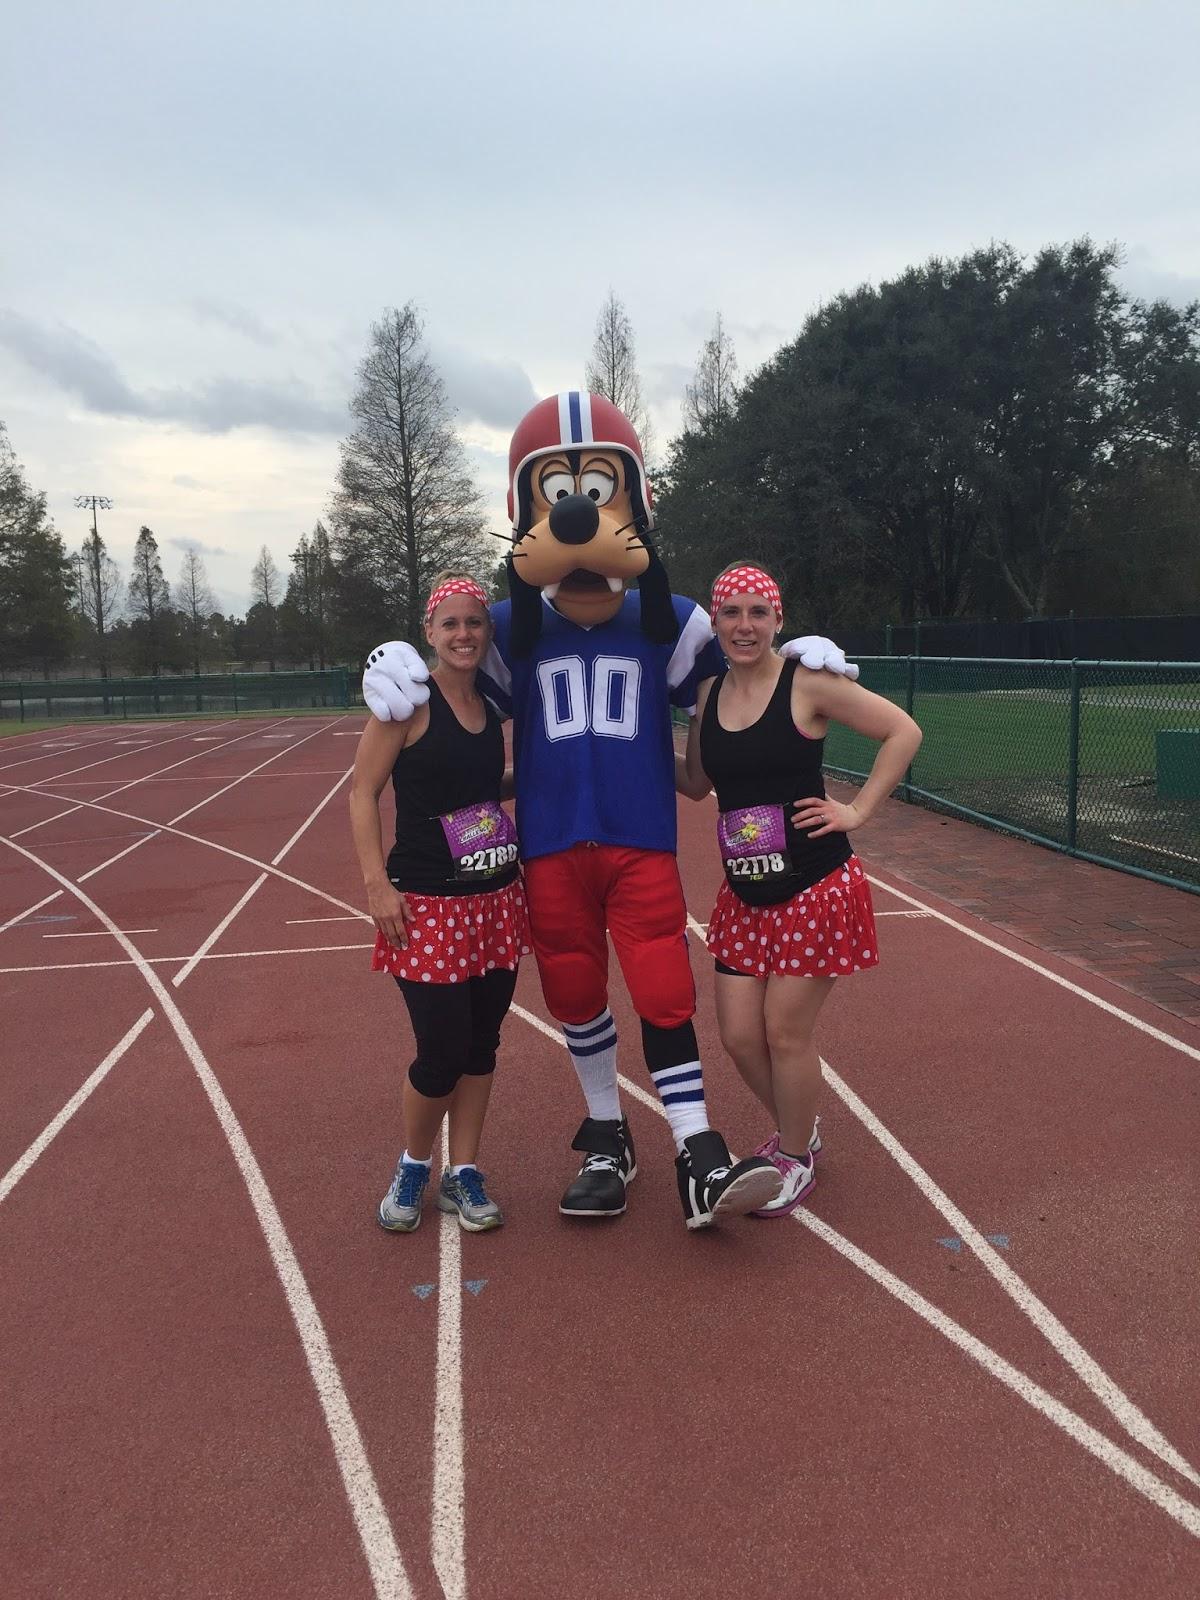 Dopey Challenge Mickey Marathon 2016 Picture with Football Goofy